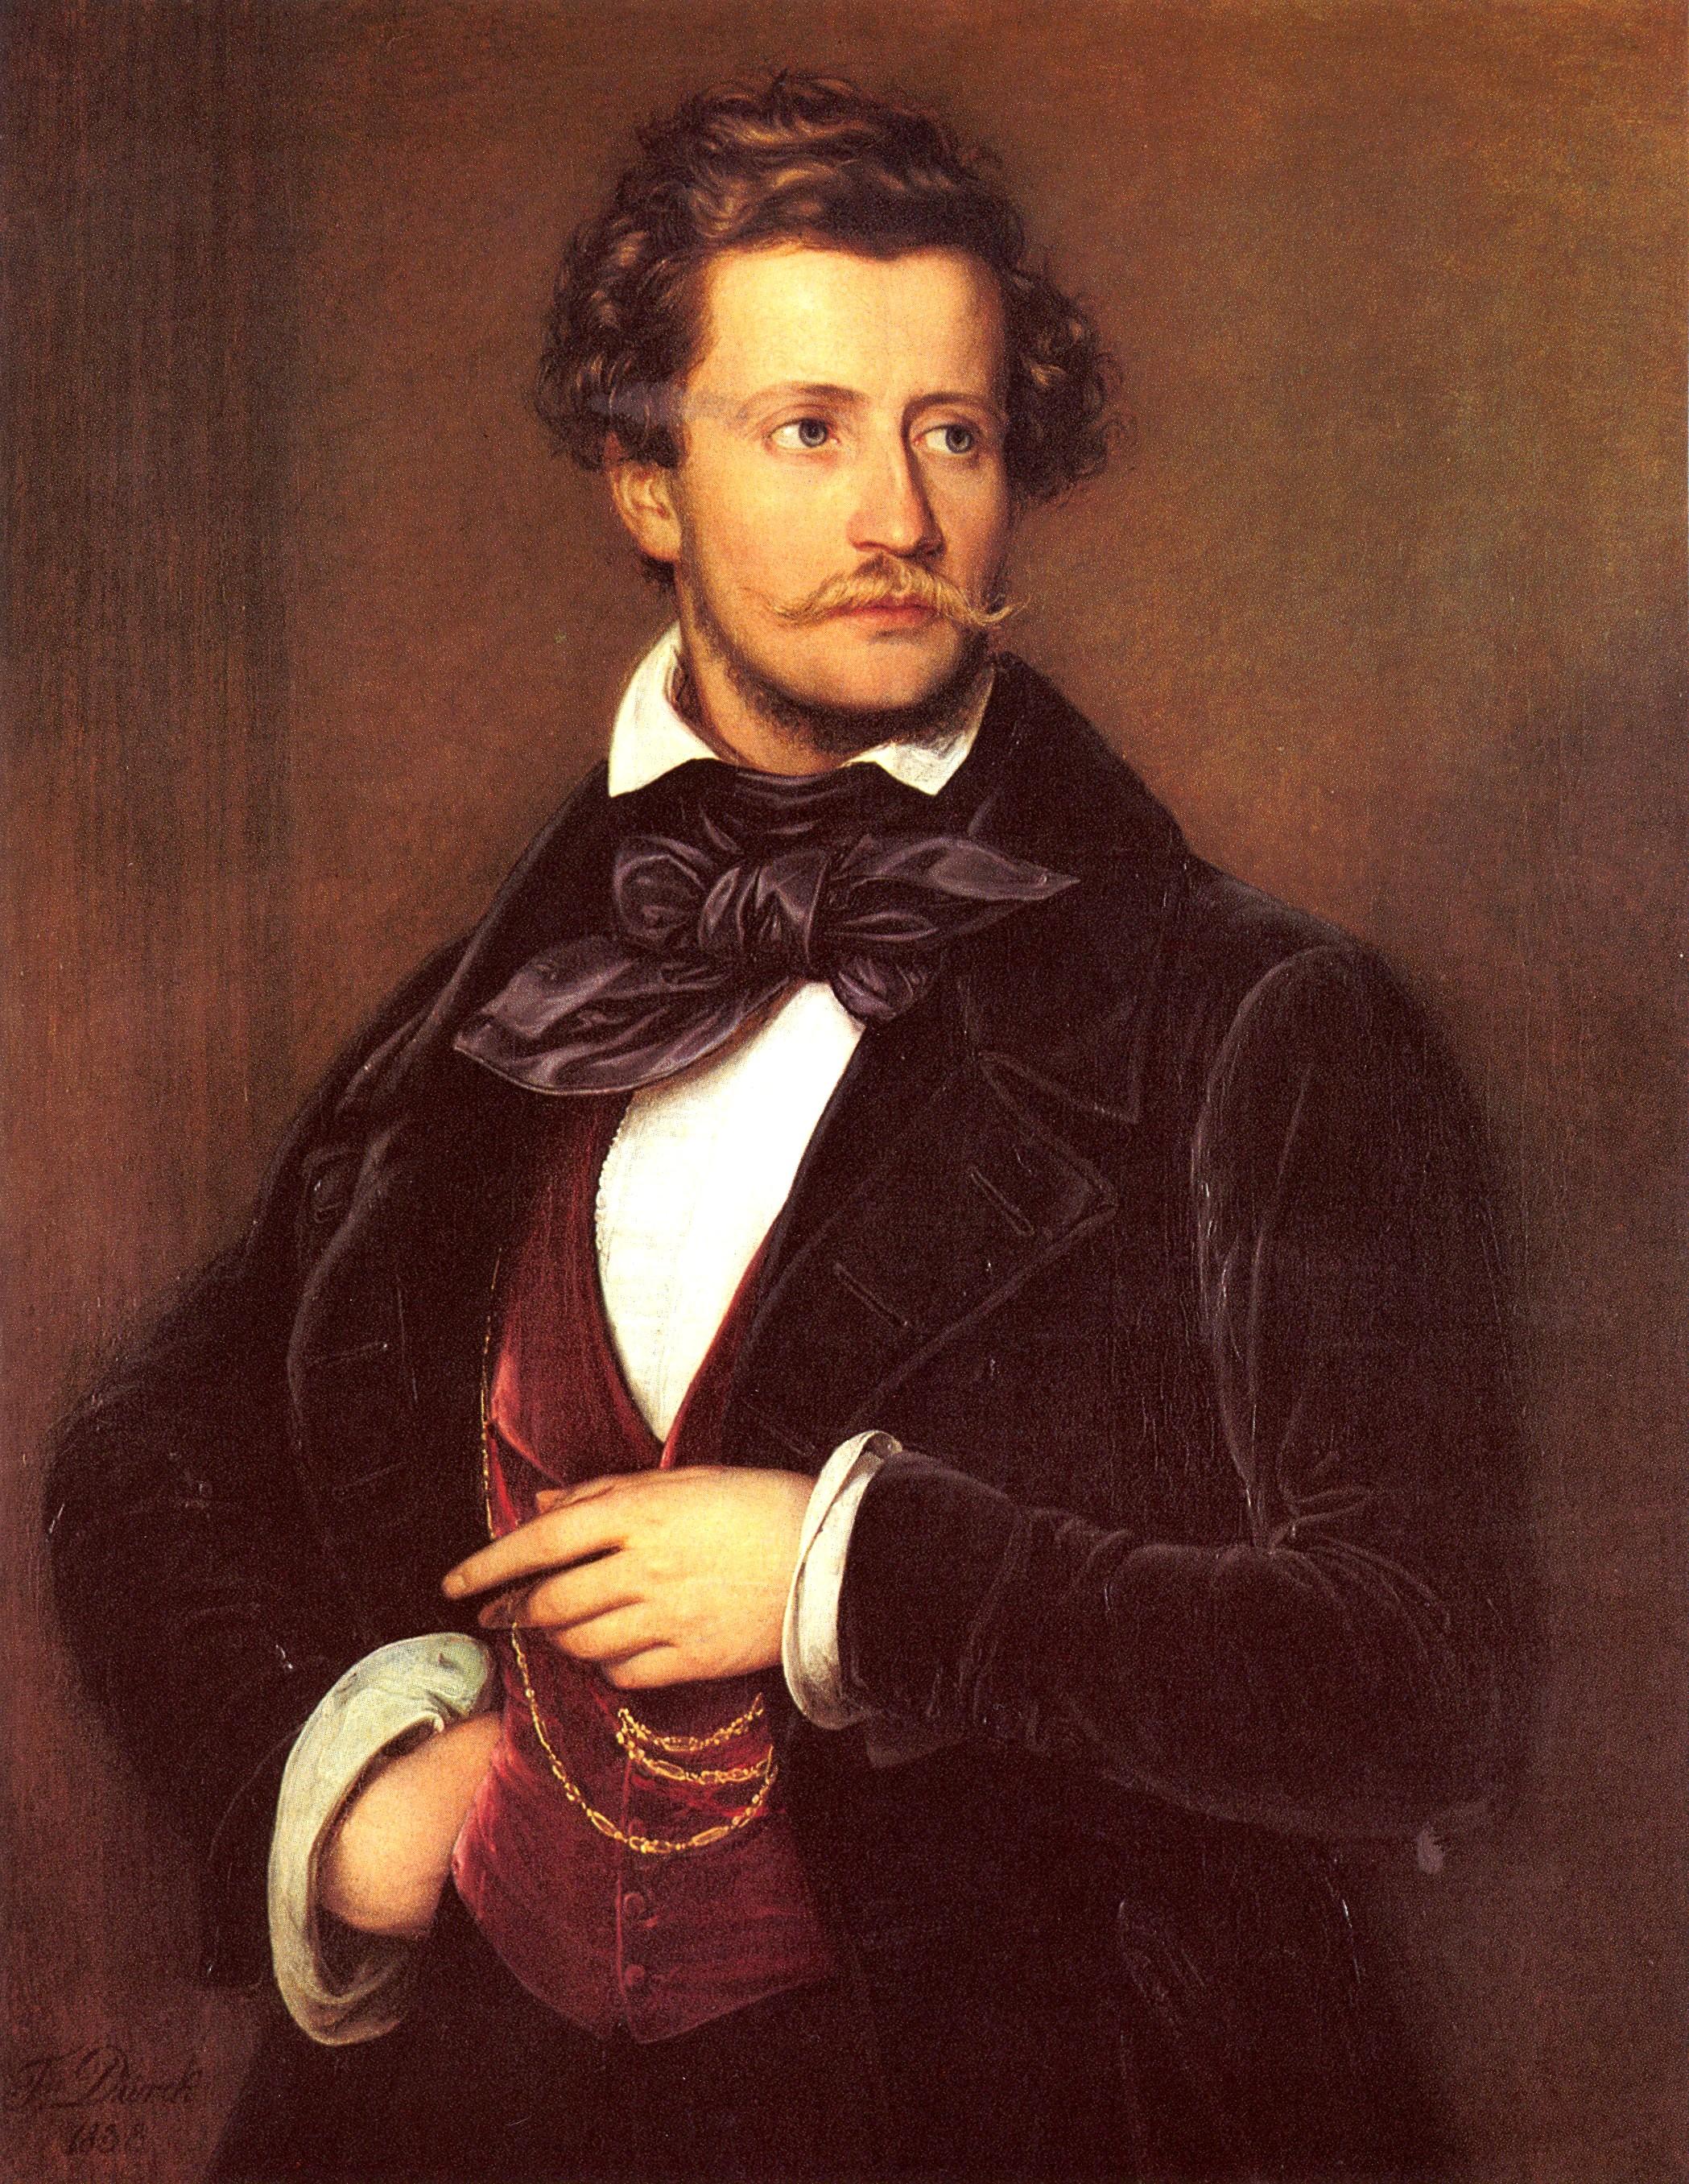 Image of Franz Seraph Hanfstaengl from Wikidata